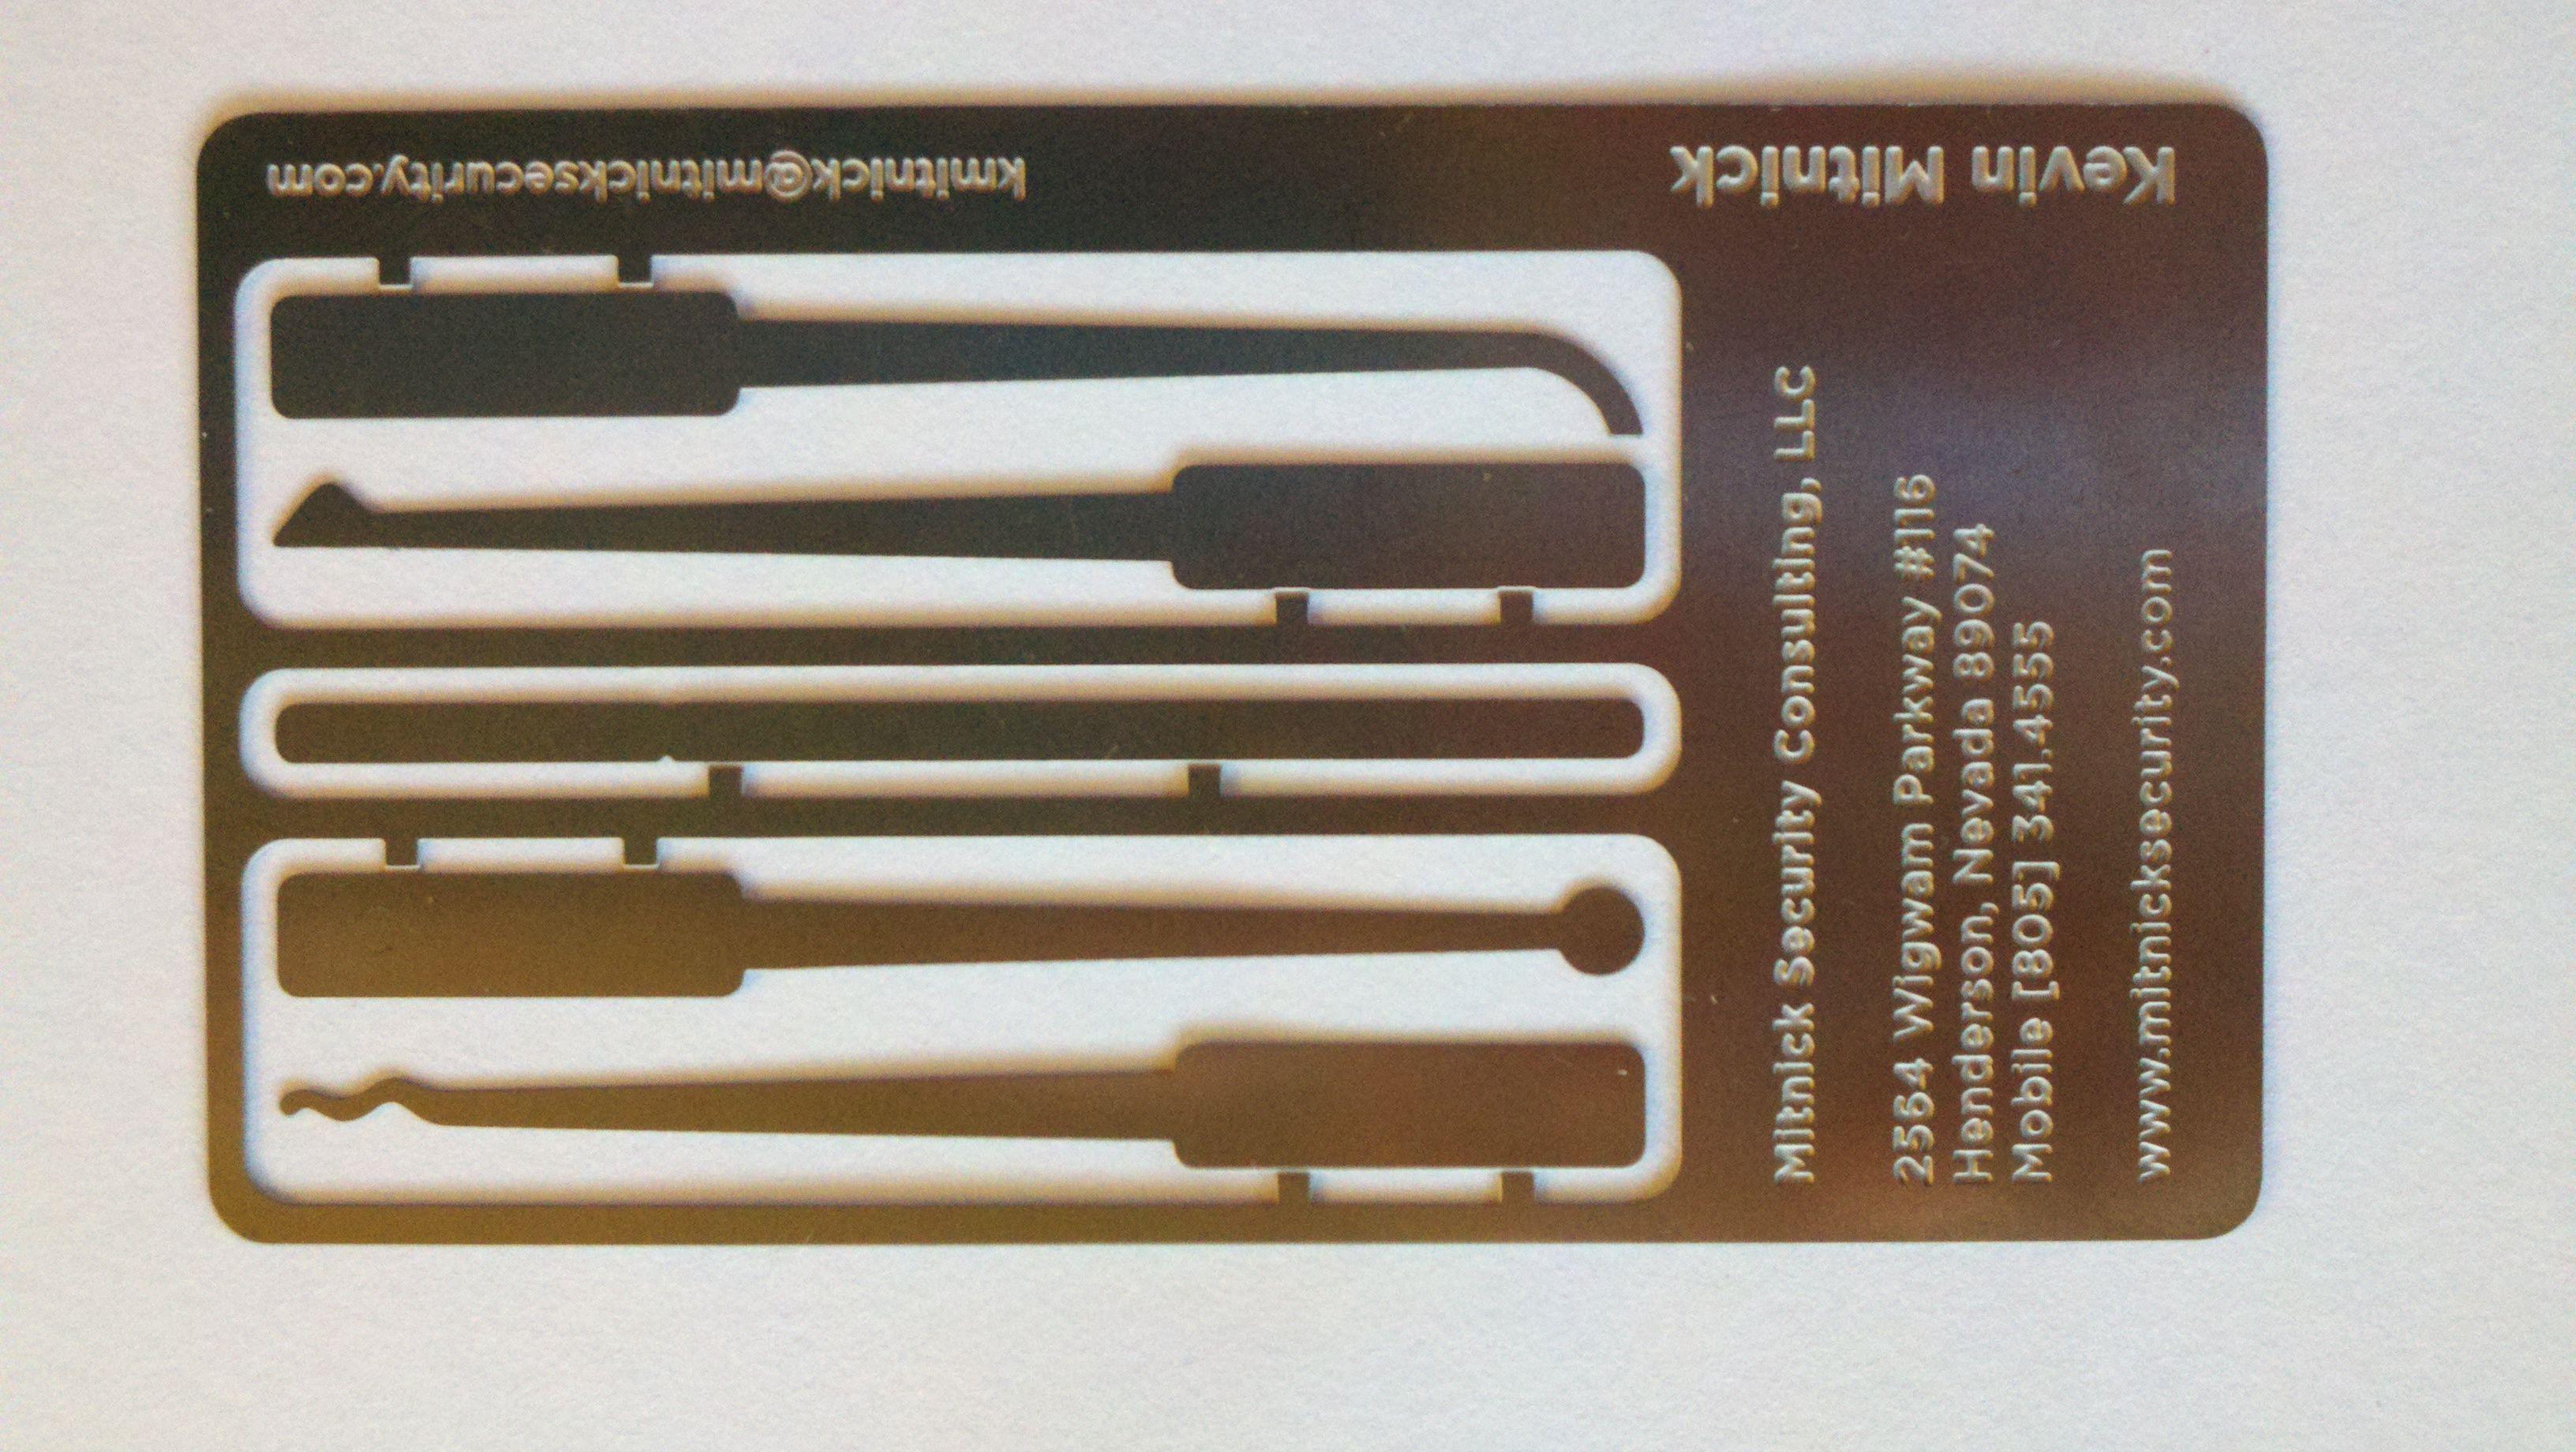 Kevin Mitnick has a business card lock-picking set : lockpicking ...